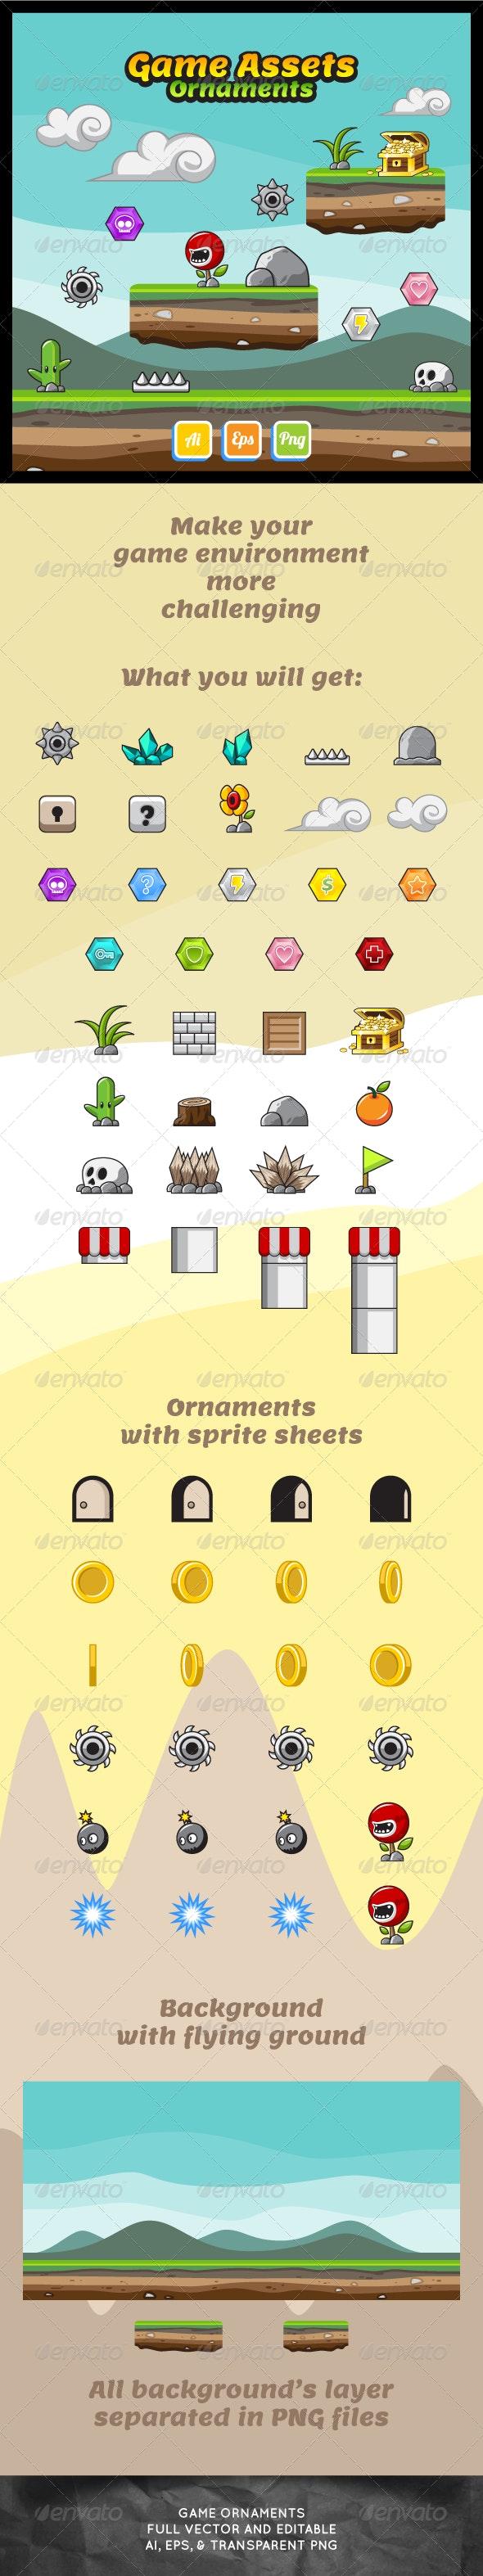 Game Asset Ornaments - Sprites Game Assets